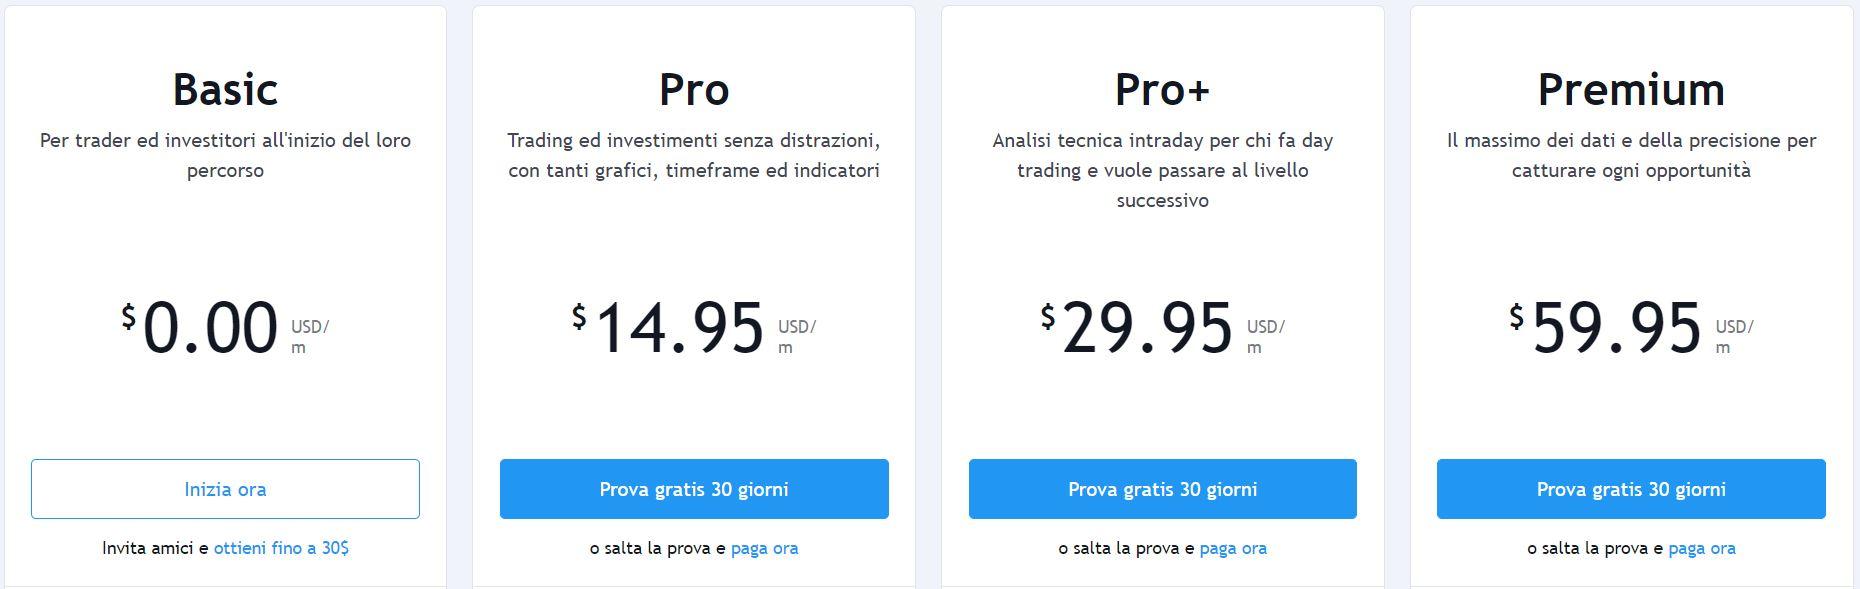 prezzi tradingview costi